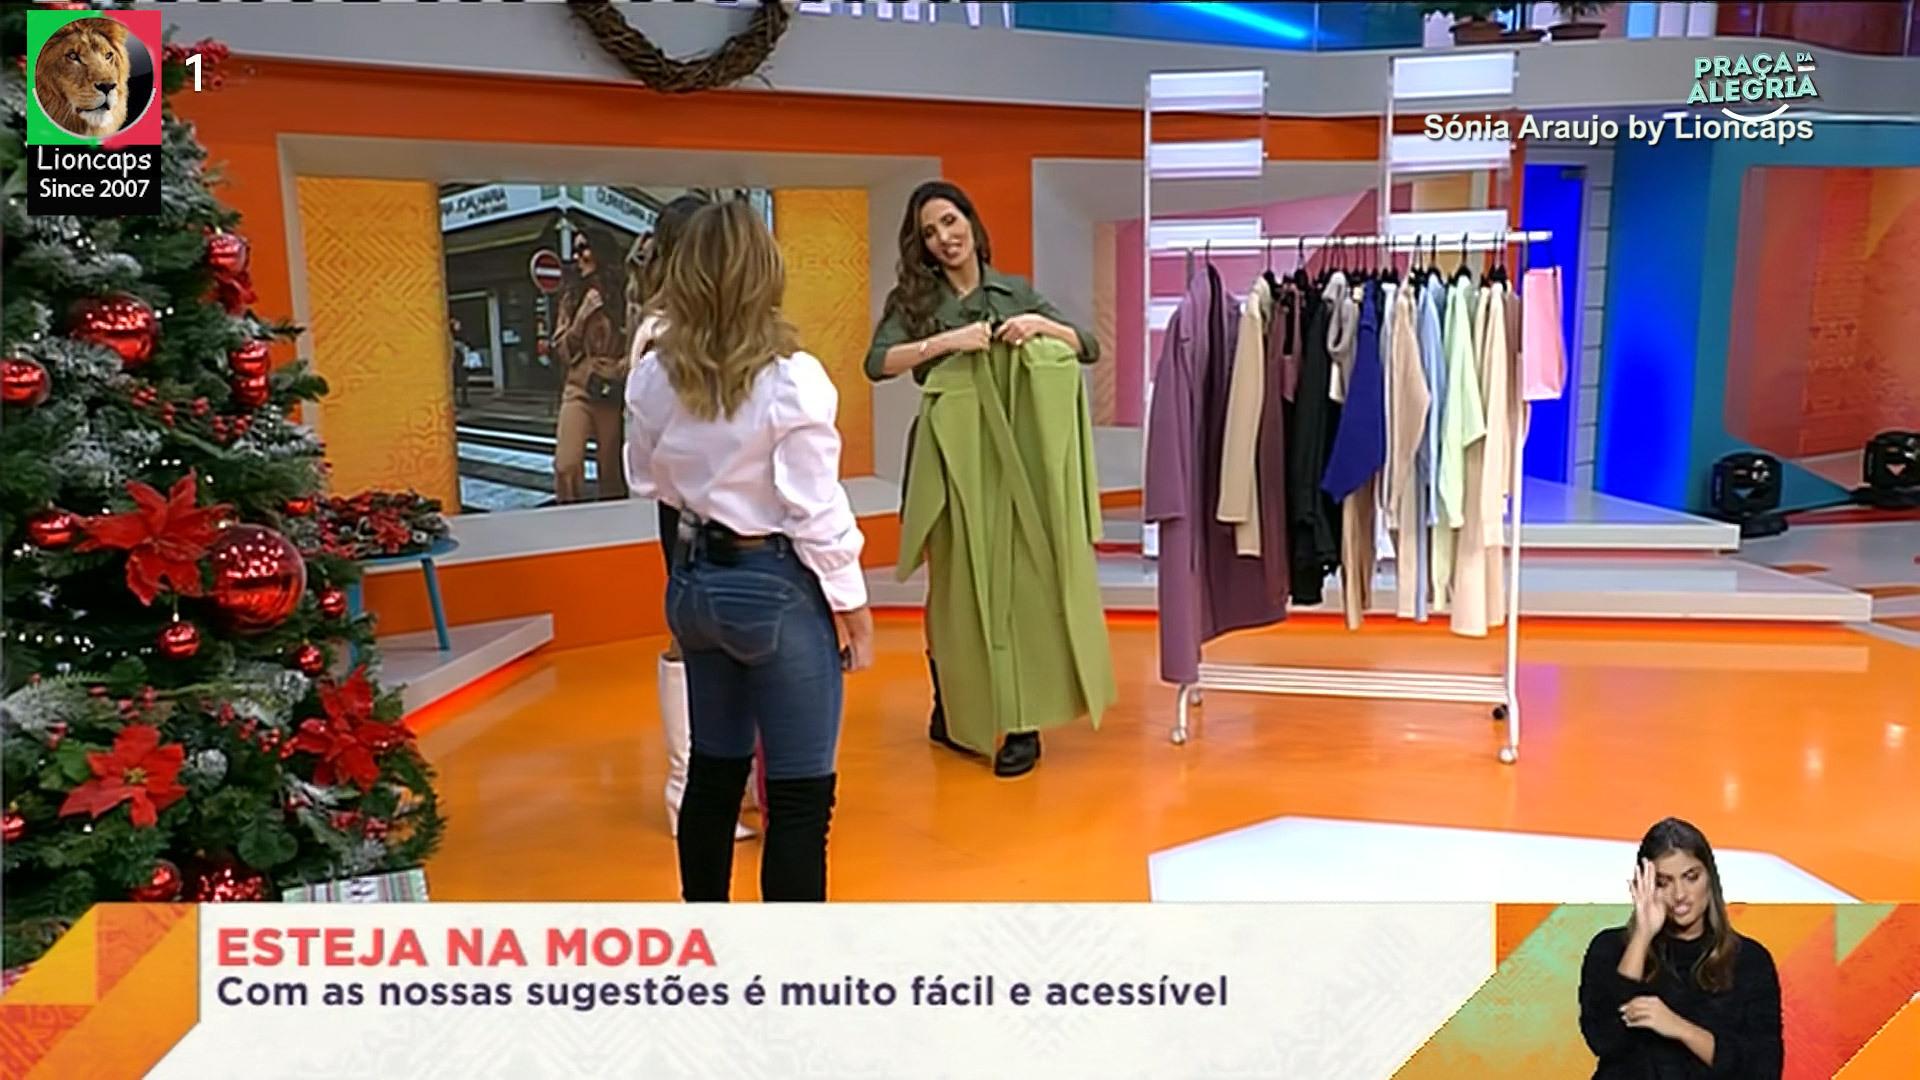 sonia_araujo_praca_lioncaps_27_03_2021_02 (15).jpg